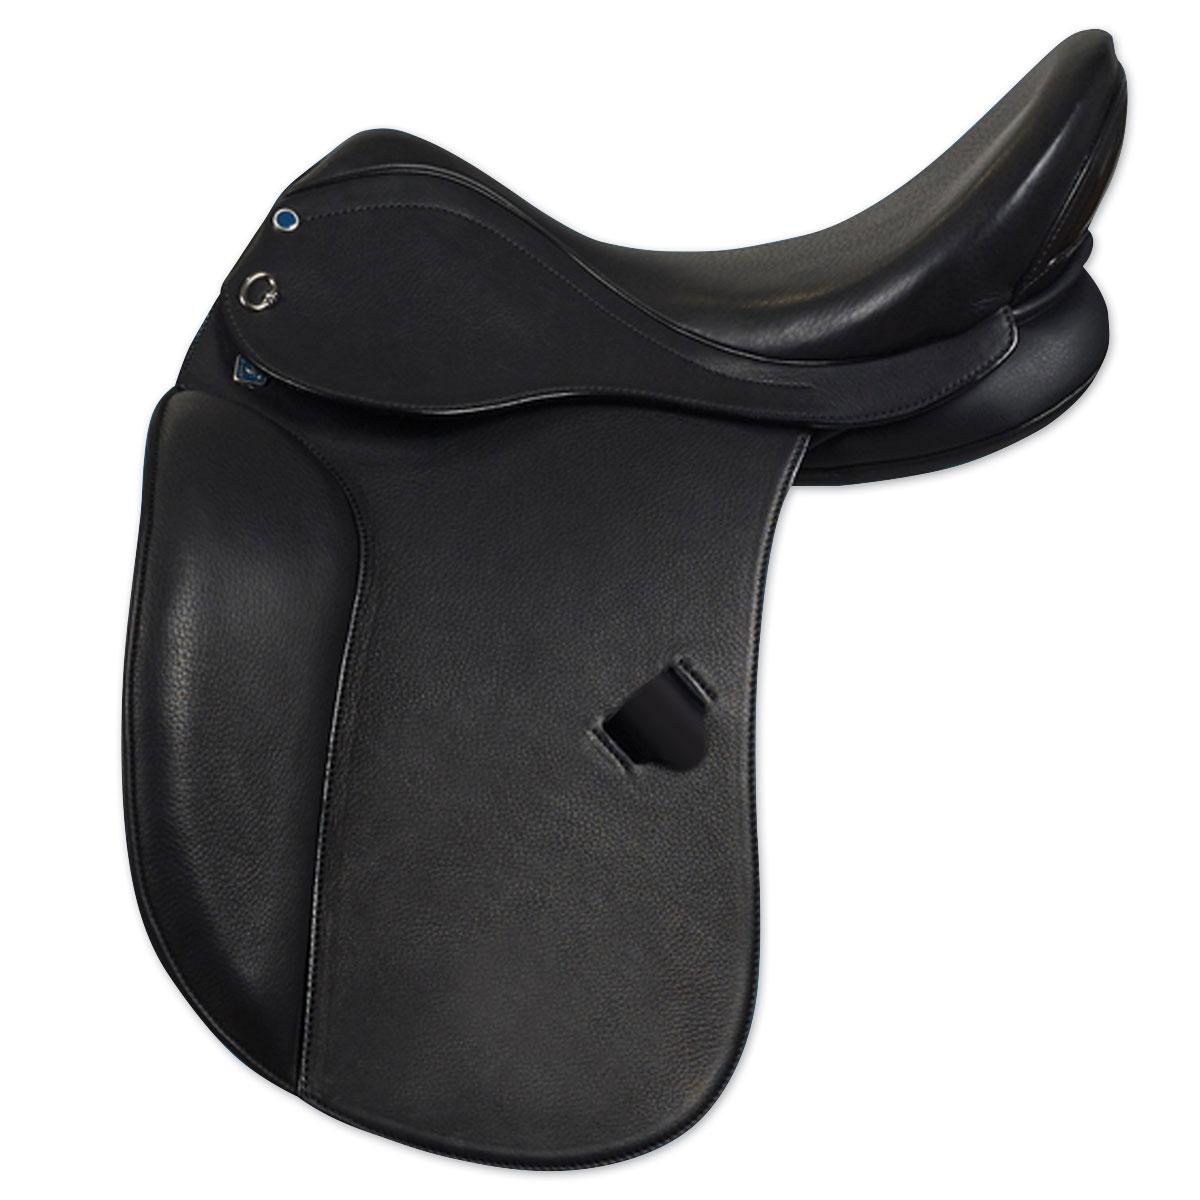 Stubben 1894 Dressage Saddle